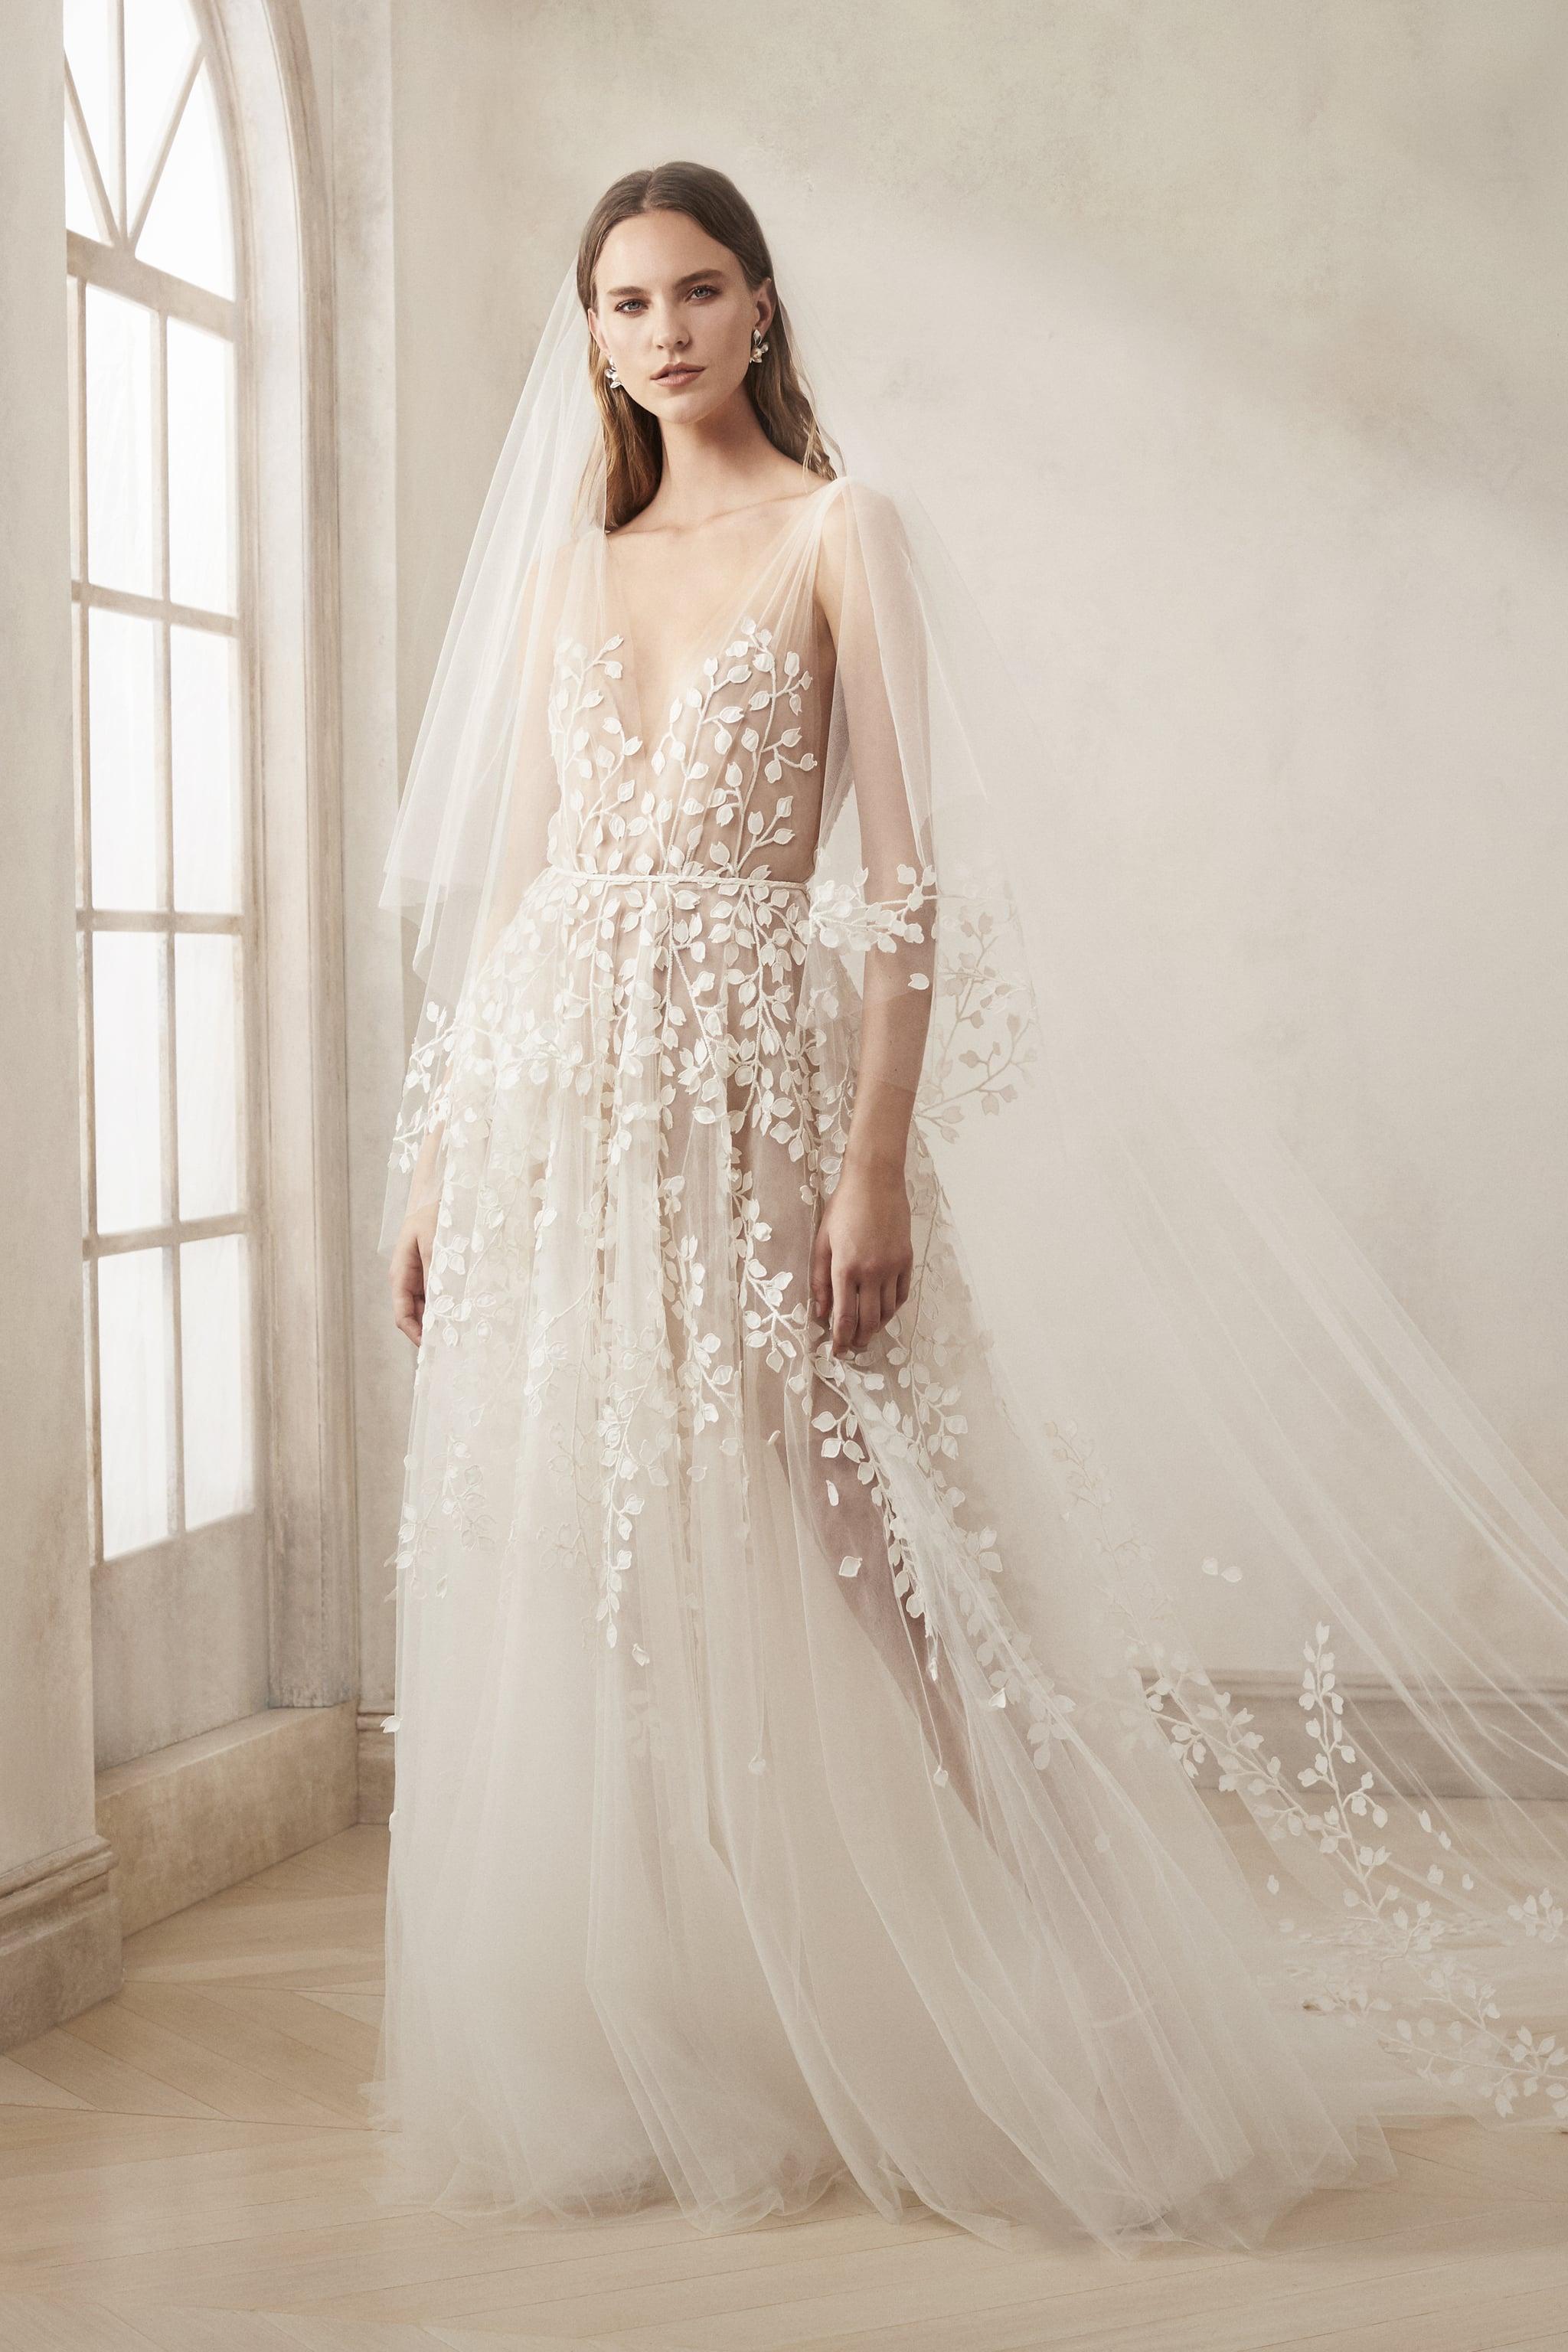 Wedding Dress Trends For The 2020 Bride Popsugar Fashion,Beach Cocktail Dress Wedding